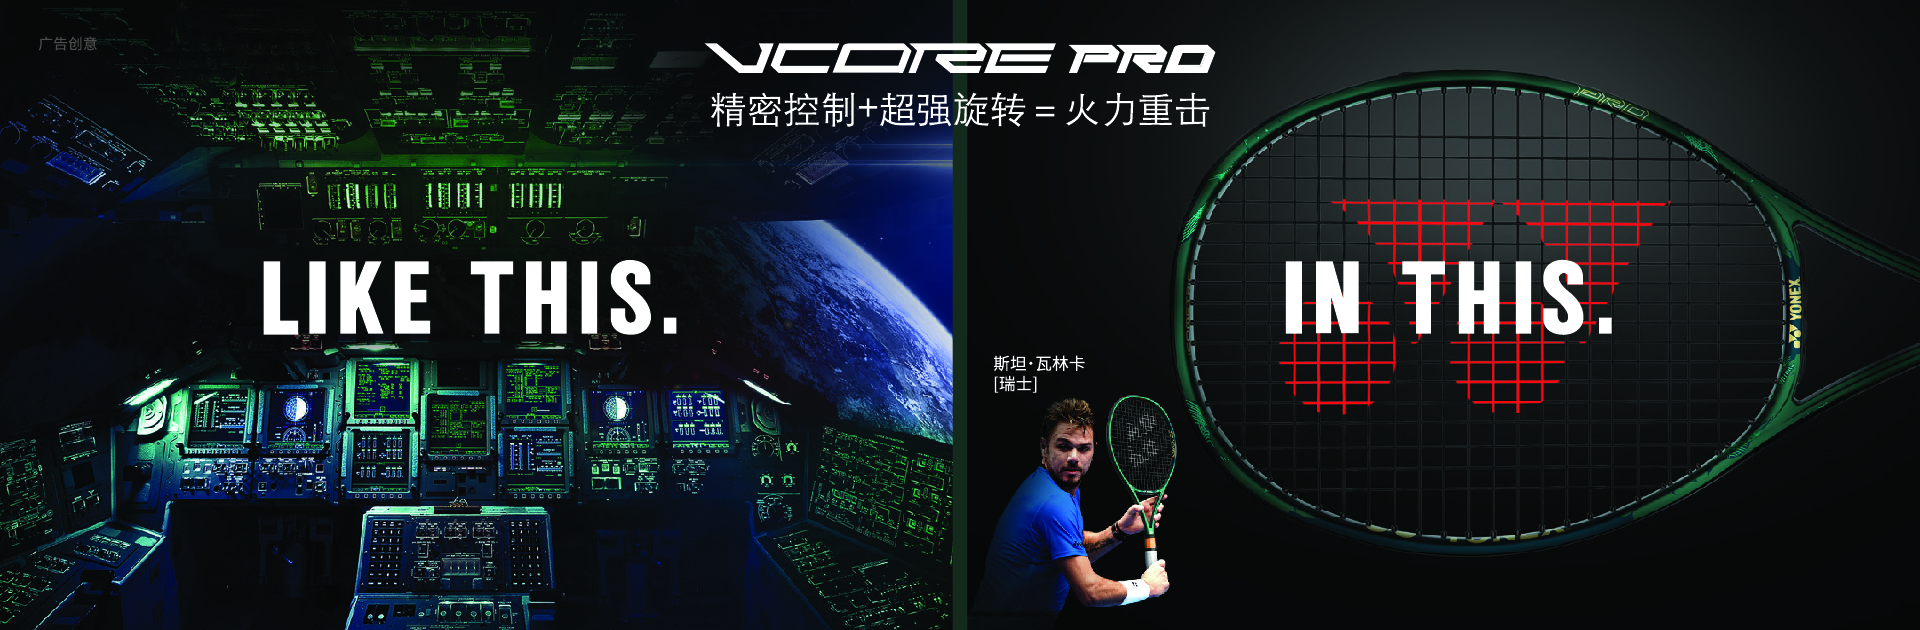 NEW VCORE PRO9.13